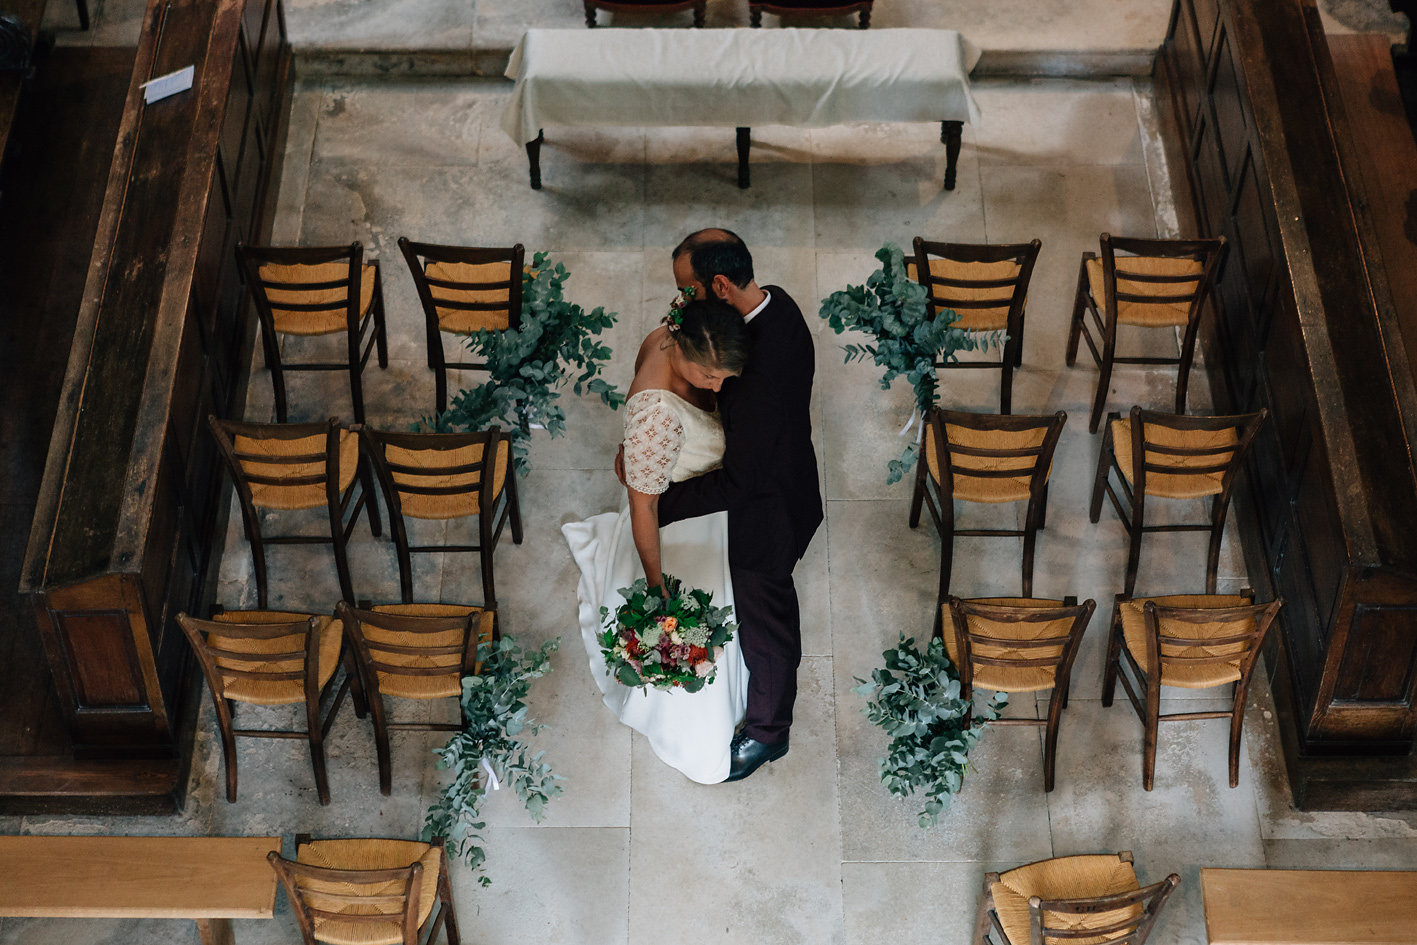 pierreatelier-photographe-mariage-paris-orangeriedevatimesnil-303.jpg